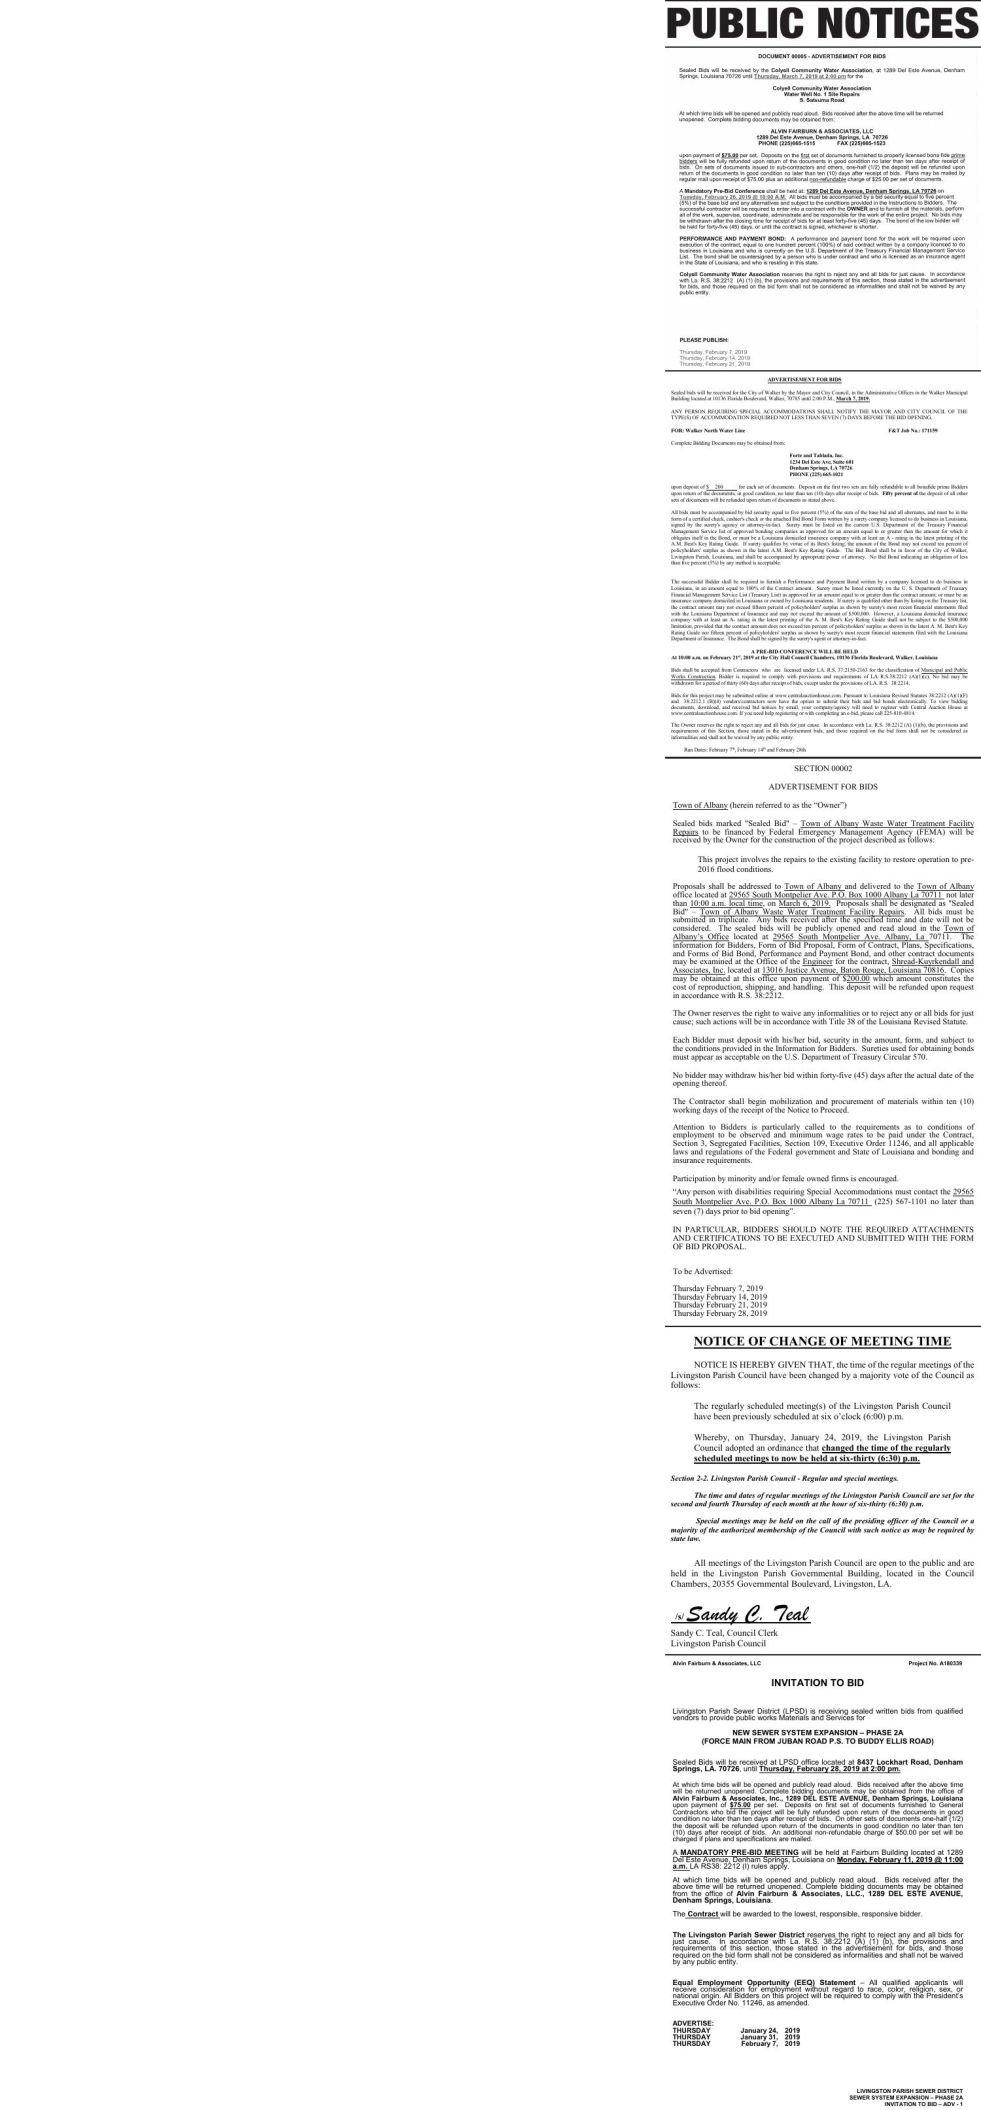 Public Notices published February 7, 2019